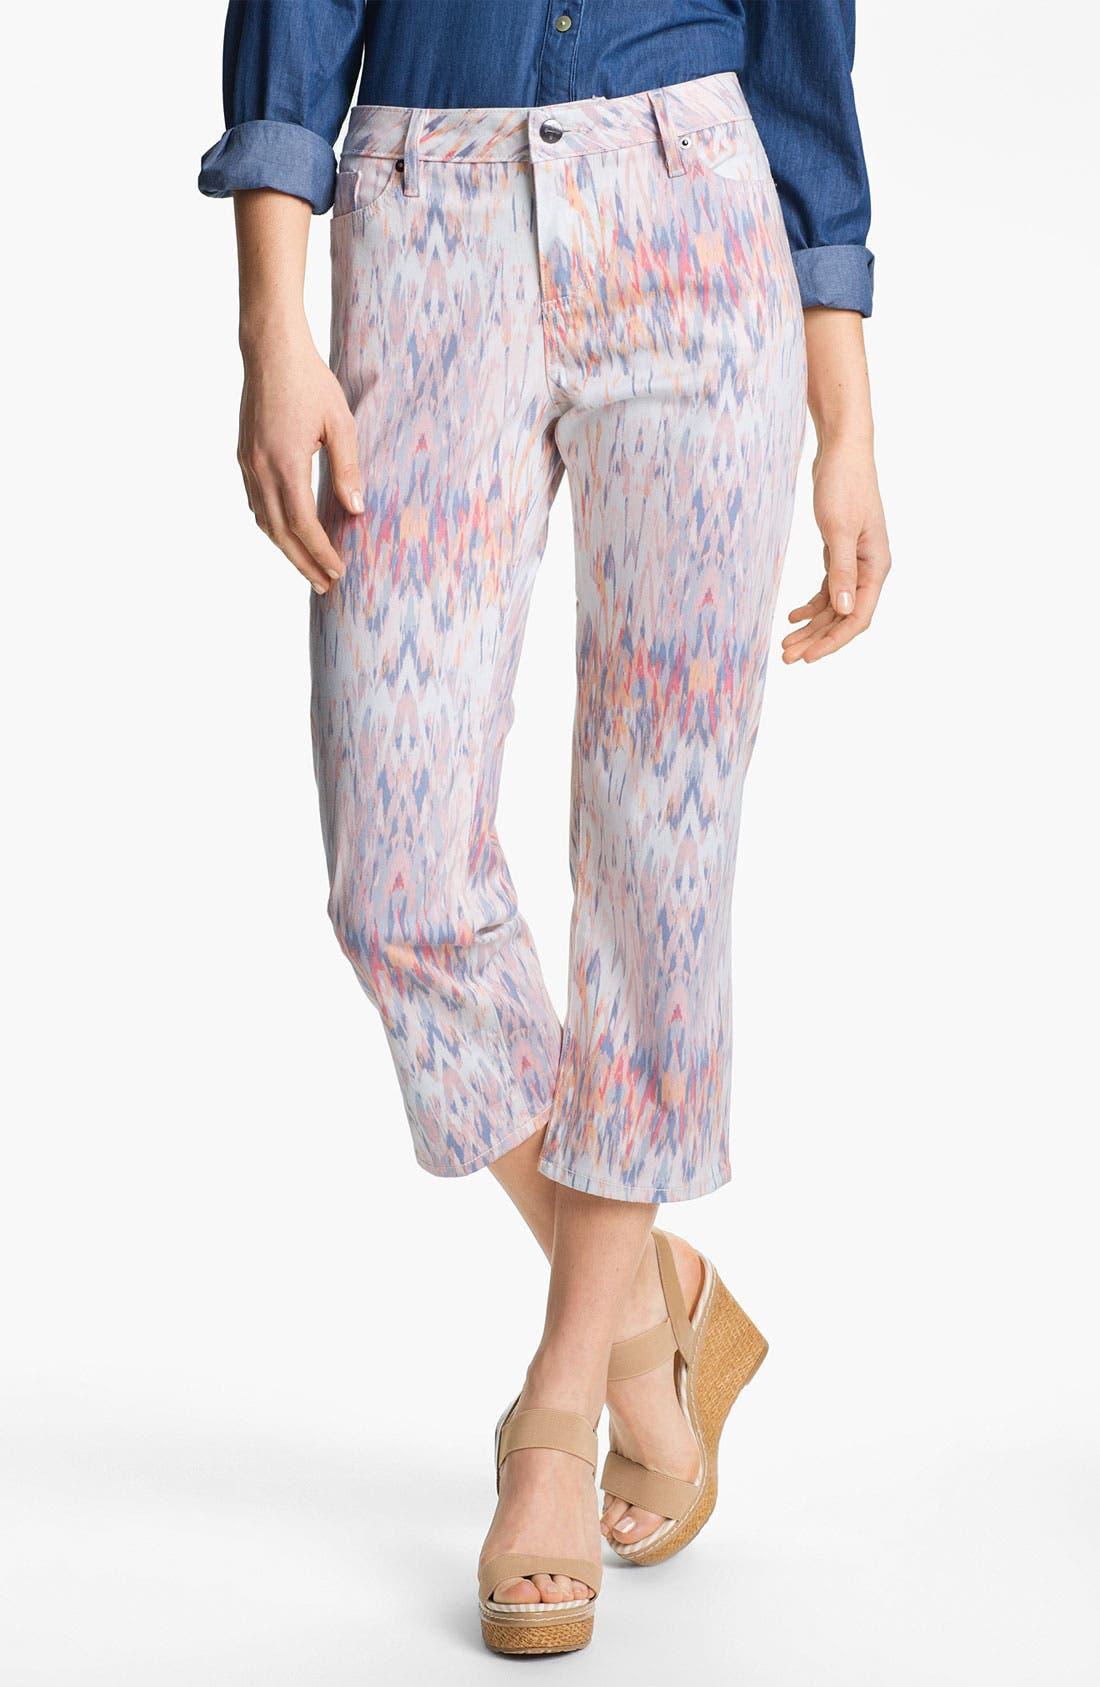 Alternate Image 1 Selected - Christopher Blue 'Chloe' Print Crop Jeans